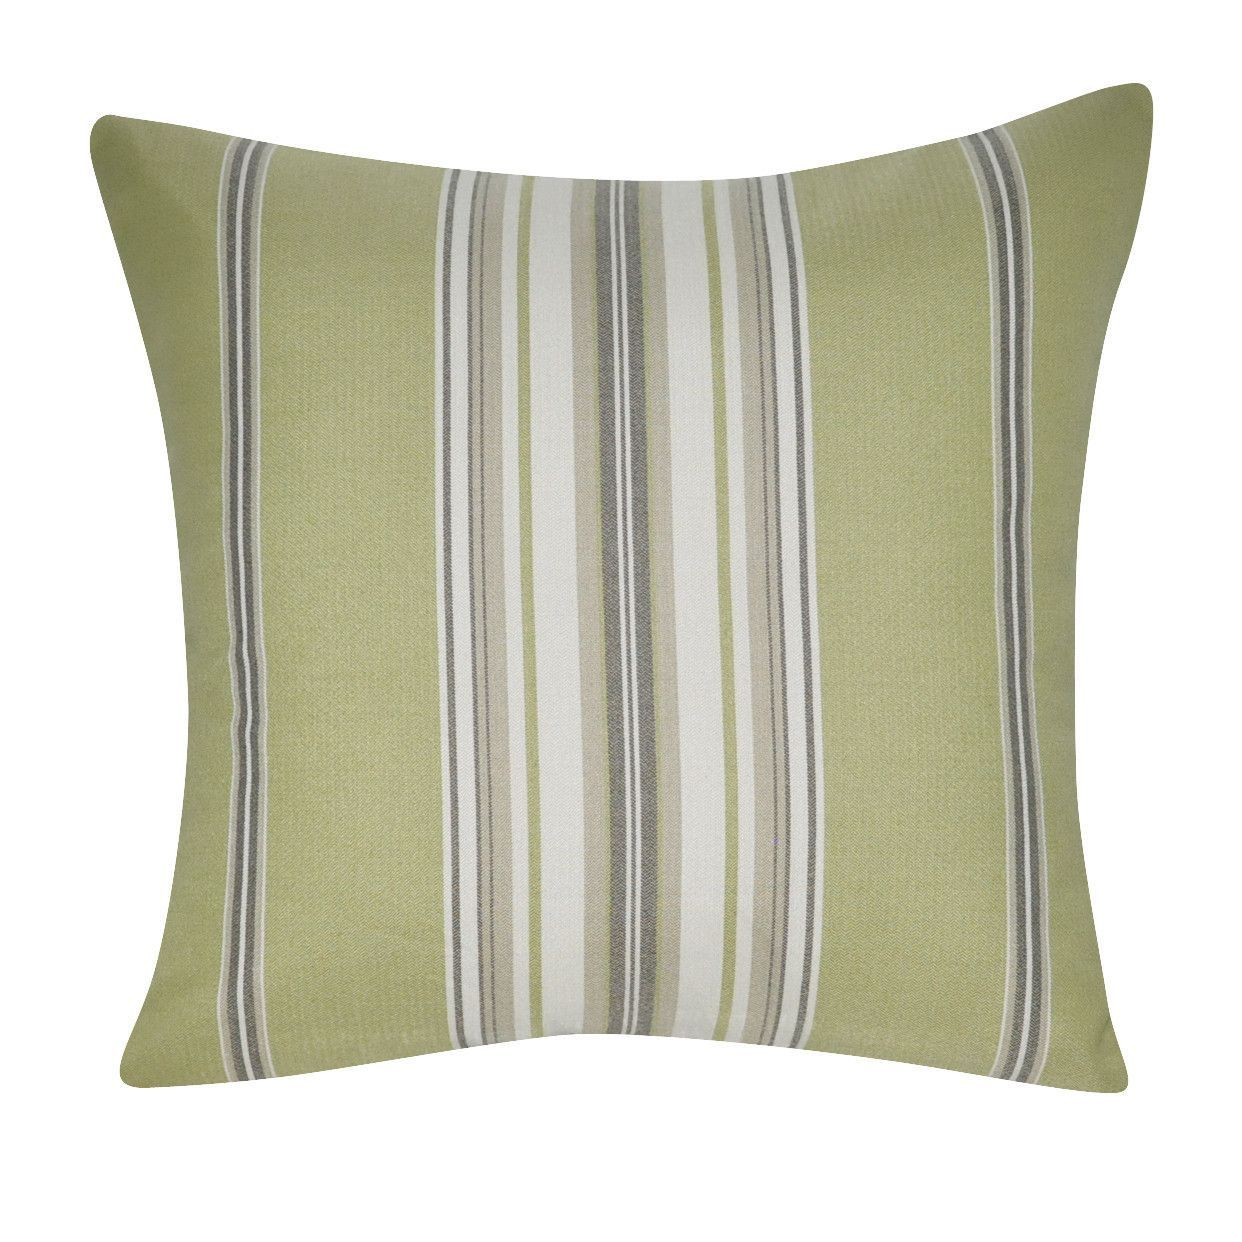 "21"" x 21"" Light Green Stripe Decorative Pillow P0191-2121P"